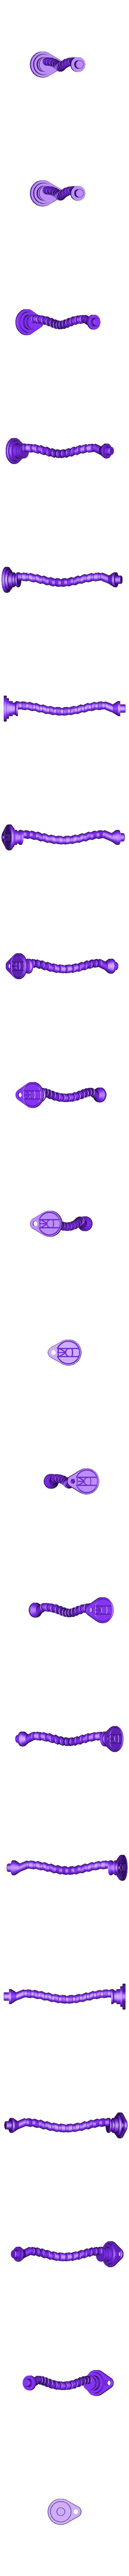 Crankshaft_30.stl Download STL file Shape Shaker_Caterpillar • Design to 3D print, Ocrobus